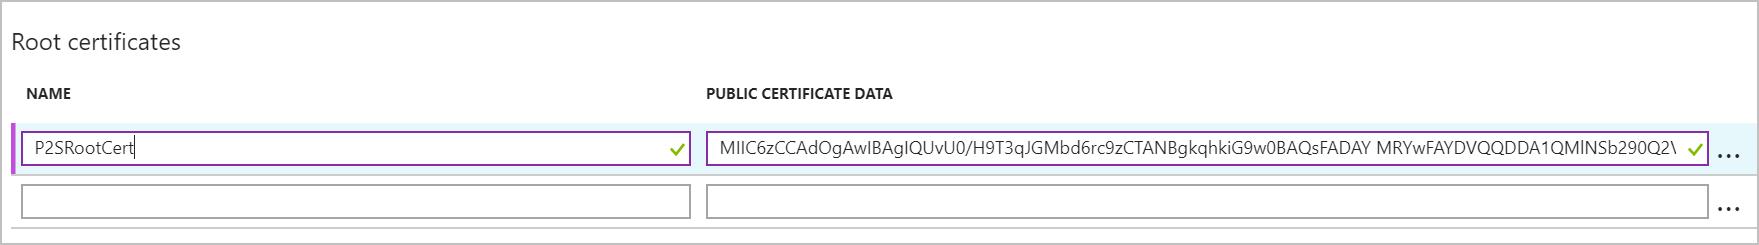 Paste certificate data